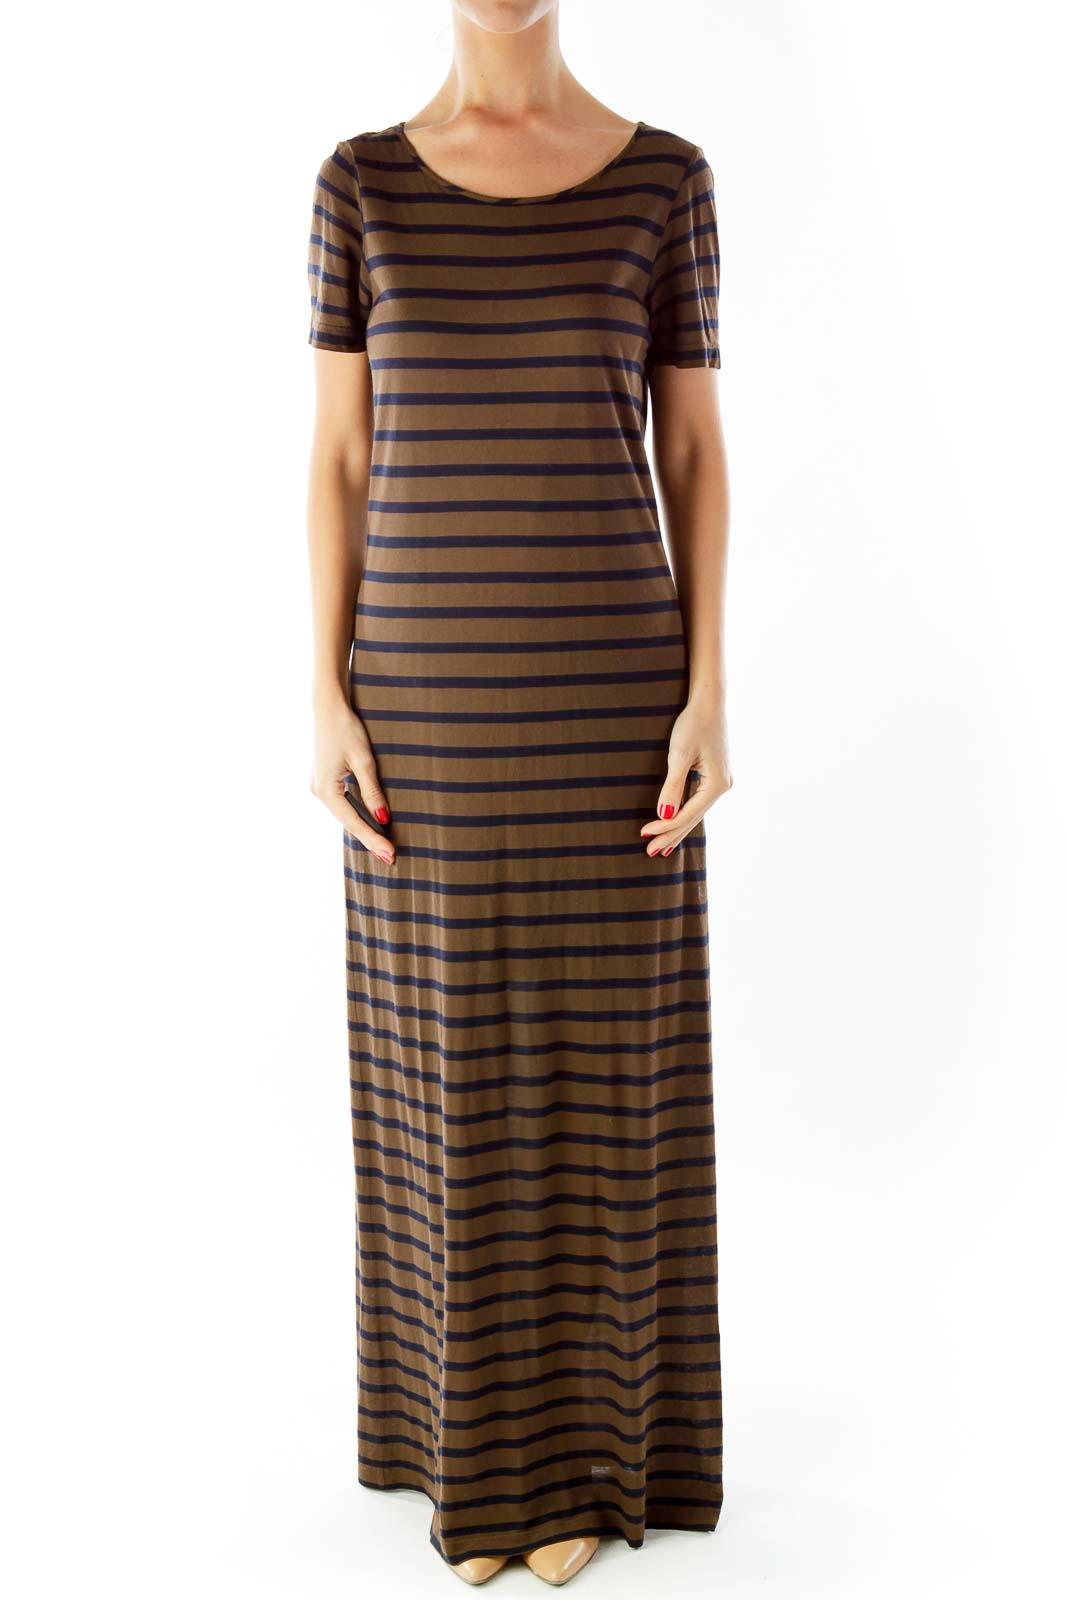 3464c5b733 Shop Brown Navy Striped Maxi Dress clothing and handbags at SilkRoll. Trade  with us!